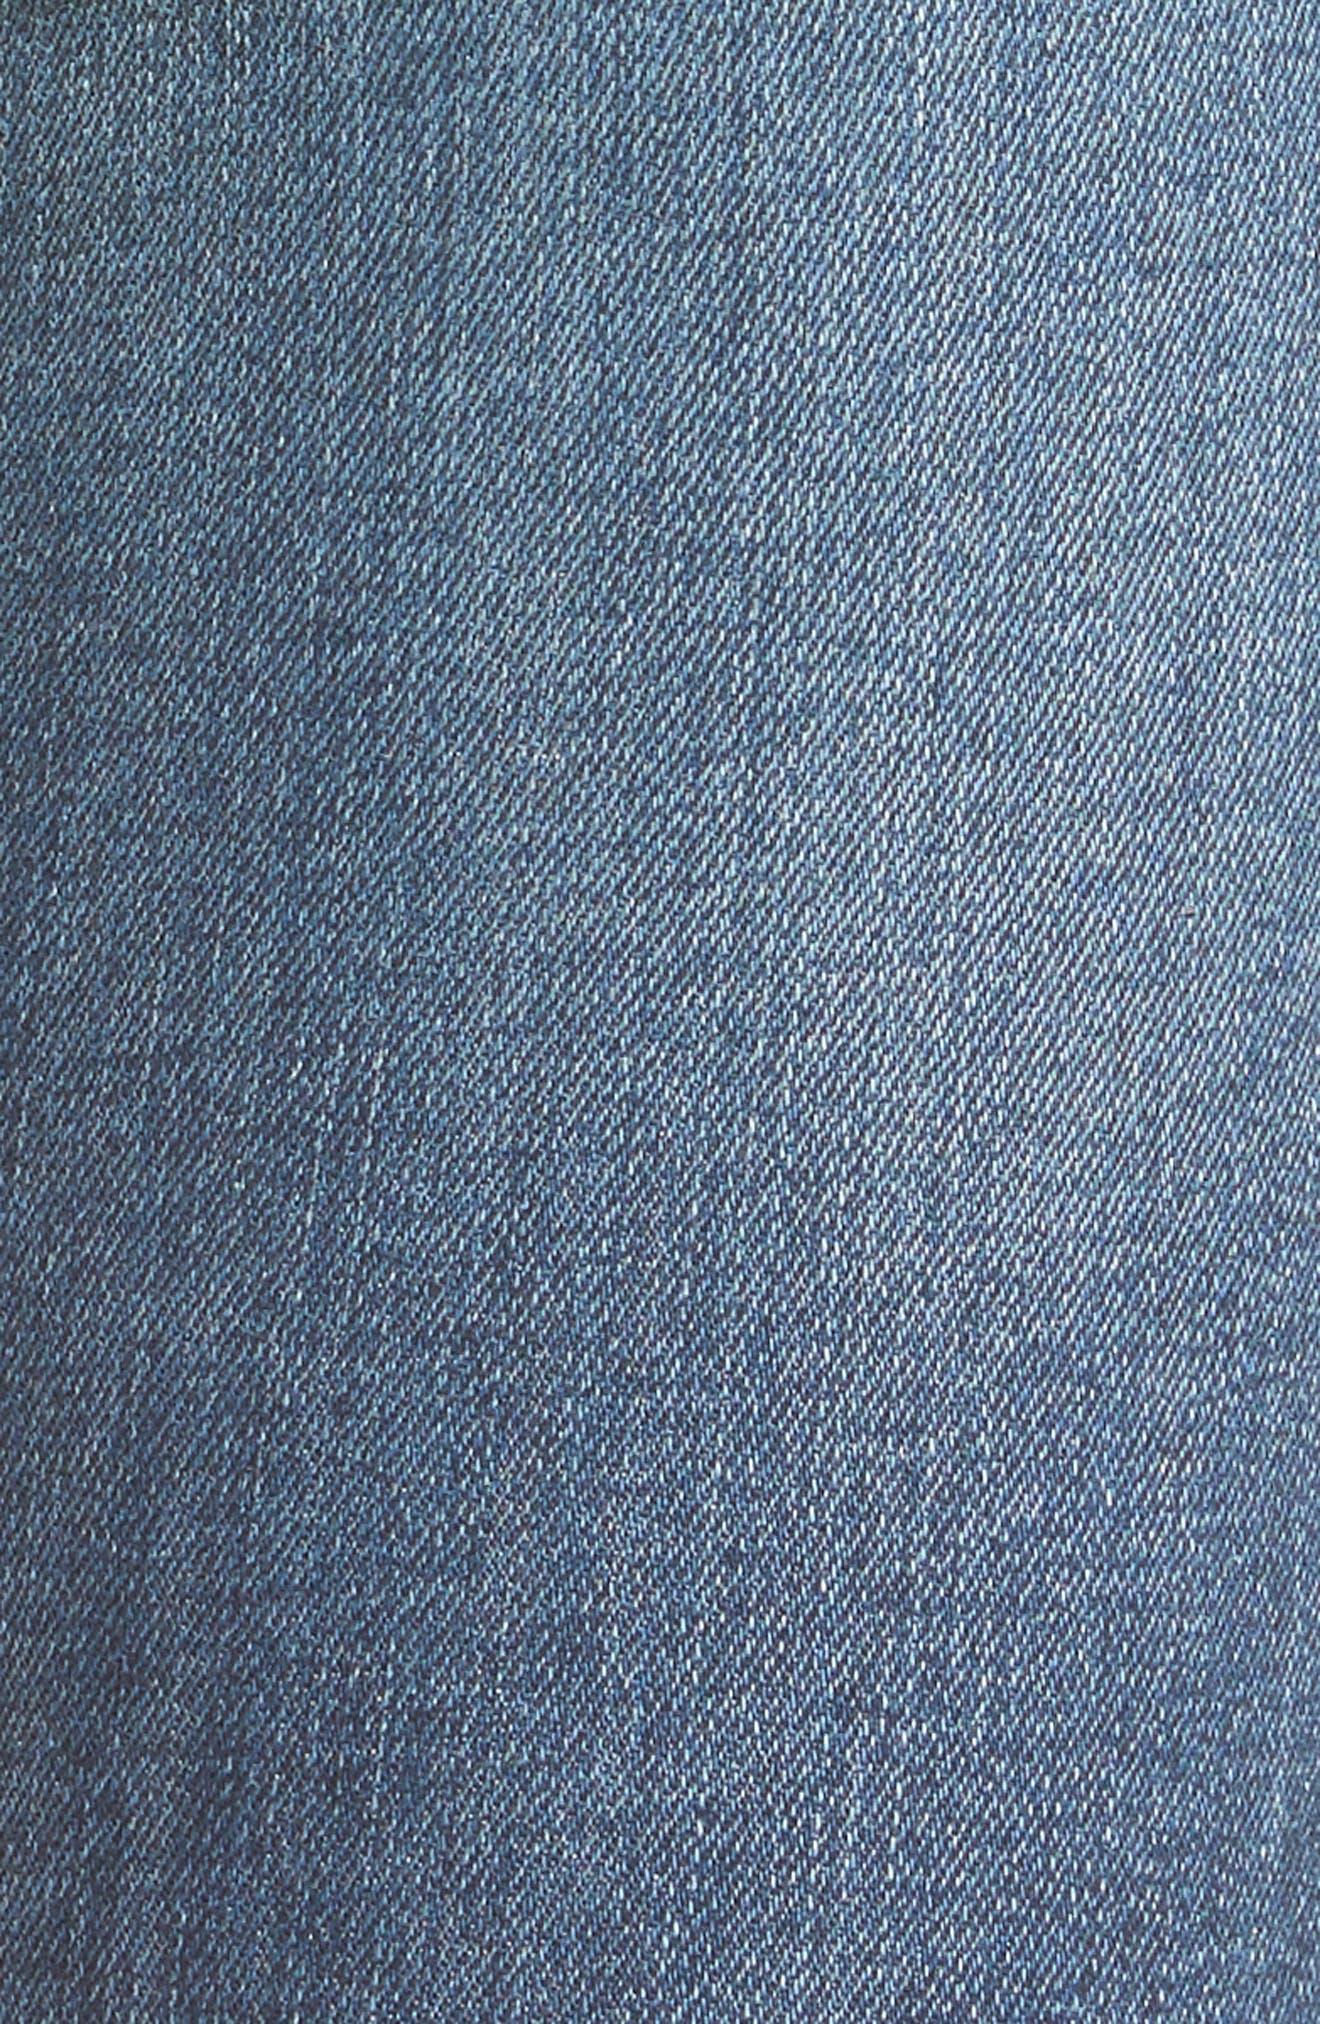 Alternate Image 5  - Hudson Jeans 'Krista' Super Skinny Jeans (Solo)